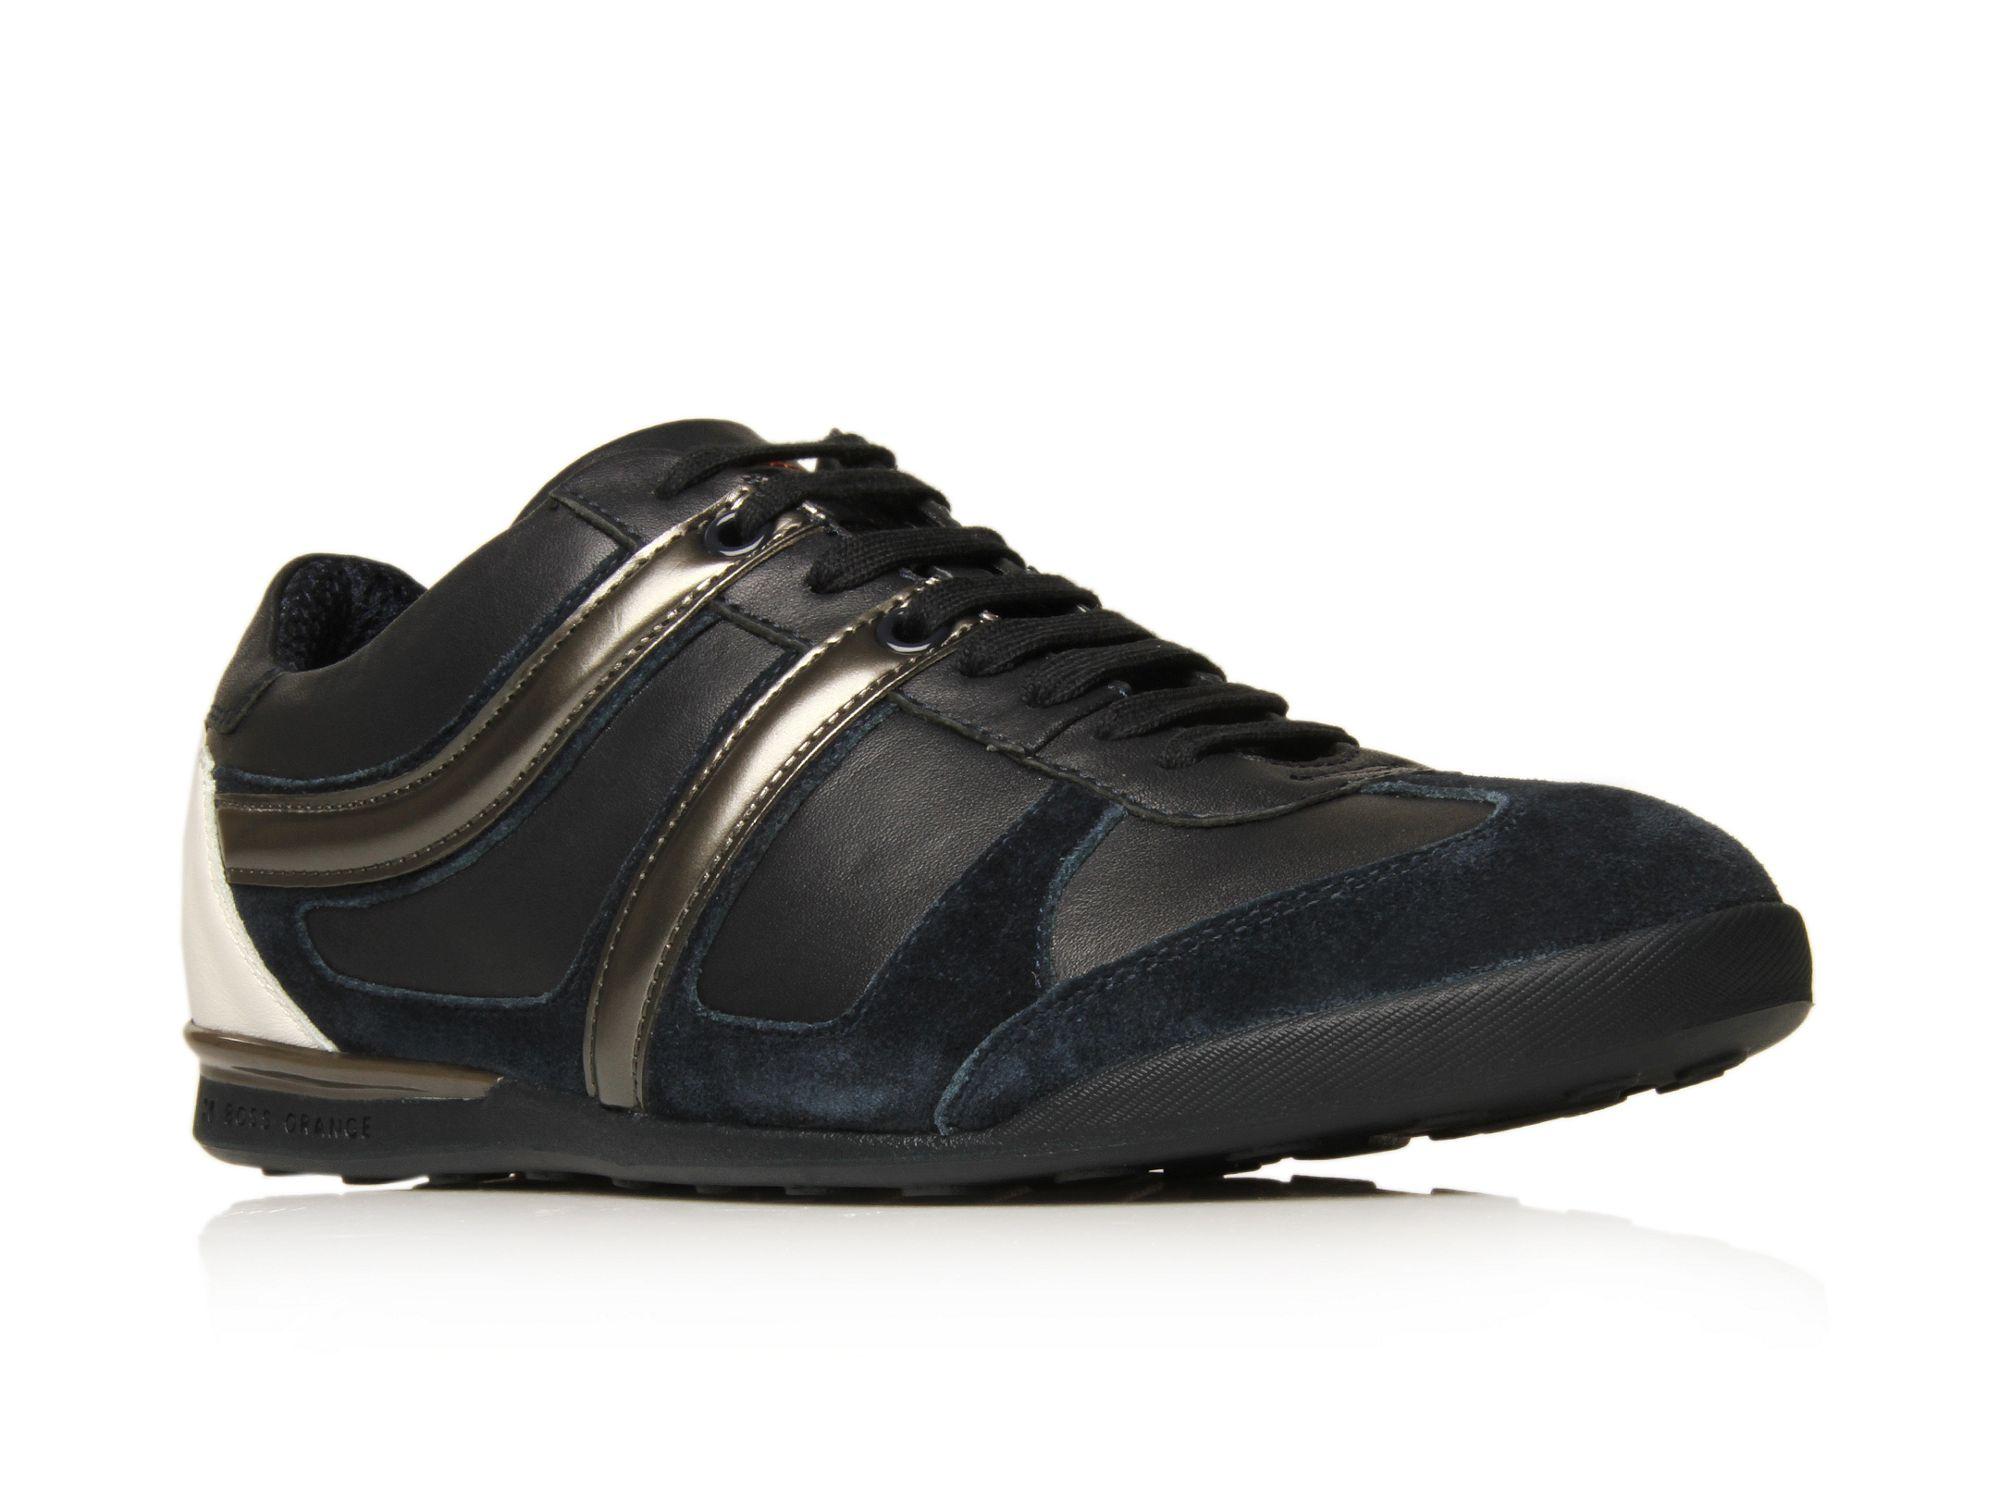 hugo boss knob sneakers in black for men navy lyst. Black Bedroom Furniture Sets. Home Design Ideas